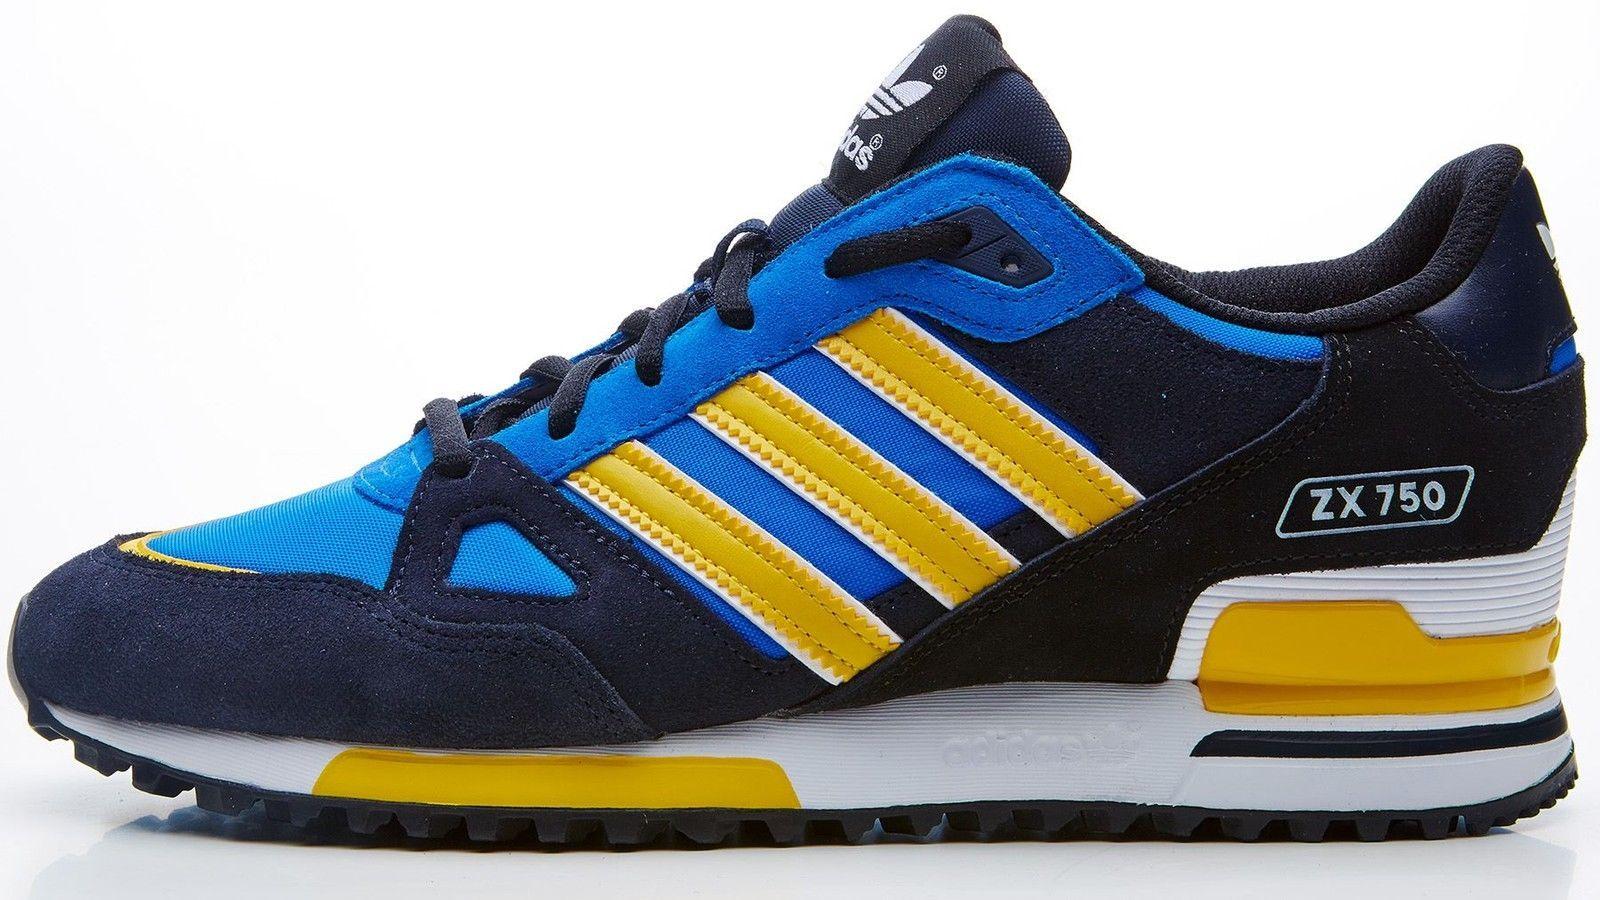 menor calendario Resplandor  adidas Originals Men's ZX 750 trainers black & blue & yellow D65230 | Adidas  originals mens, Adidas, Kanye west adidas